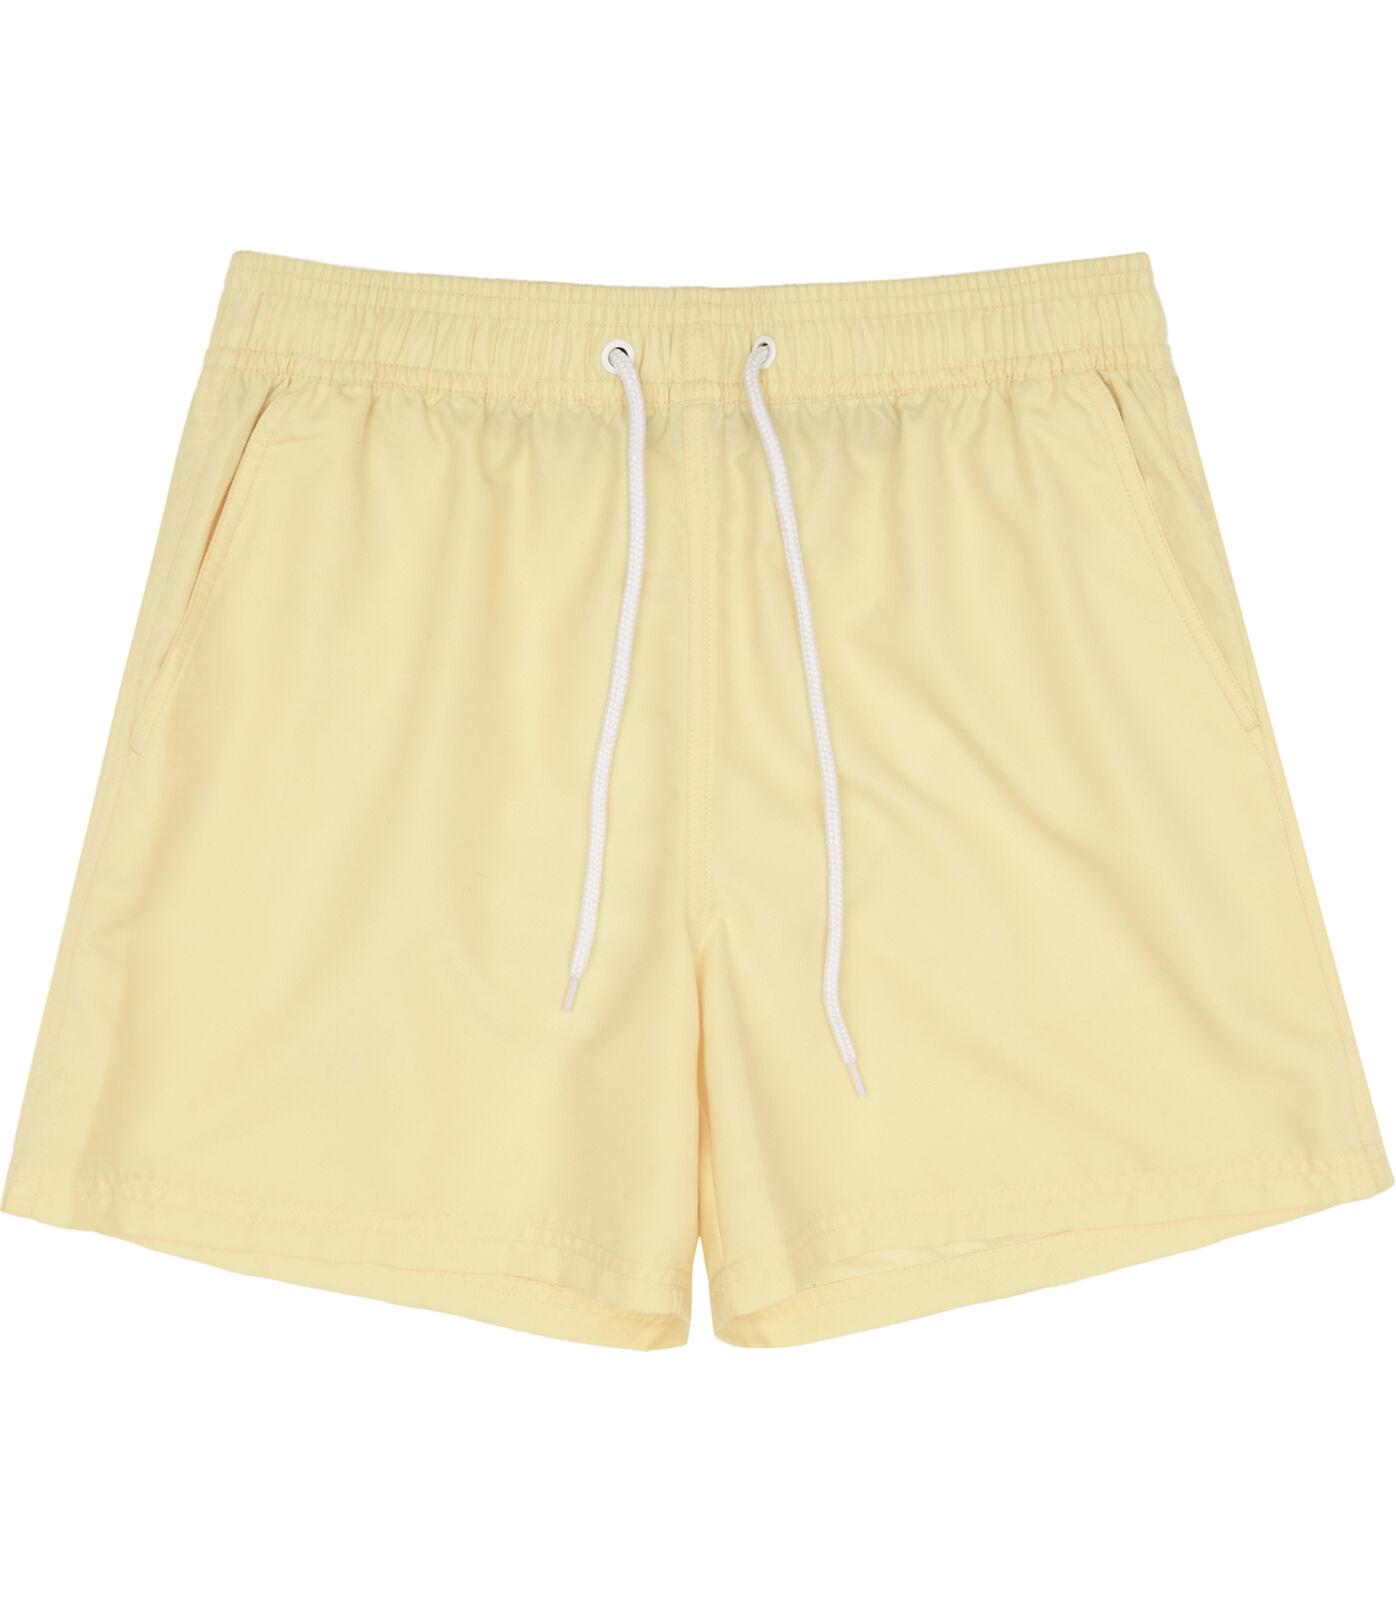 REISS Men's Thompson Yellow Plain Drawstring Swim Shorts NEW